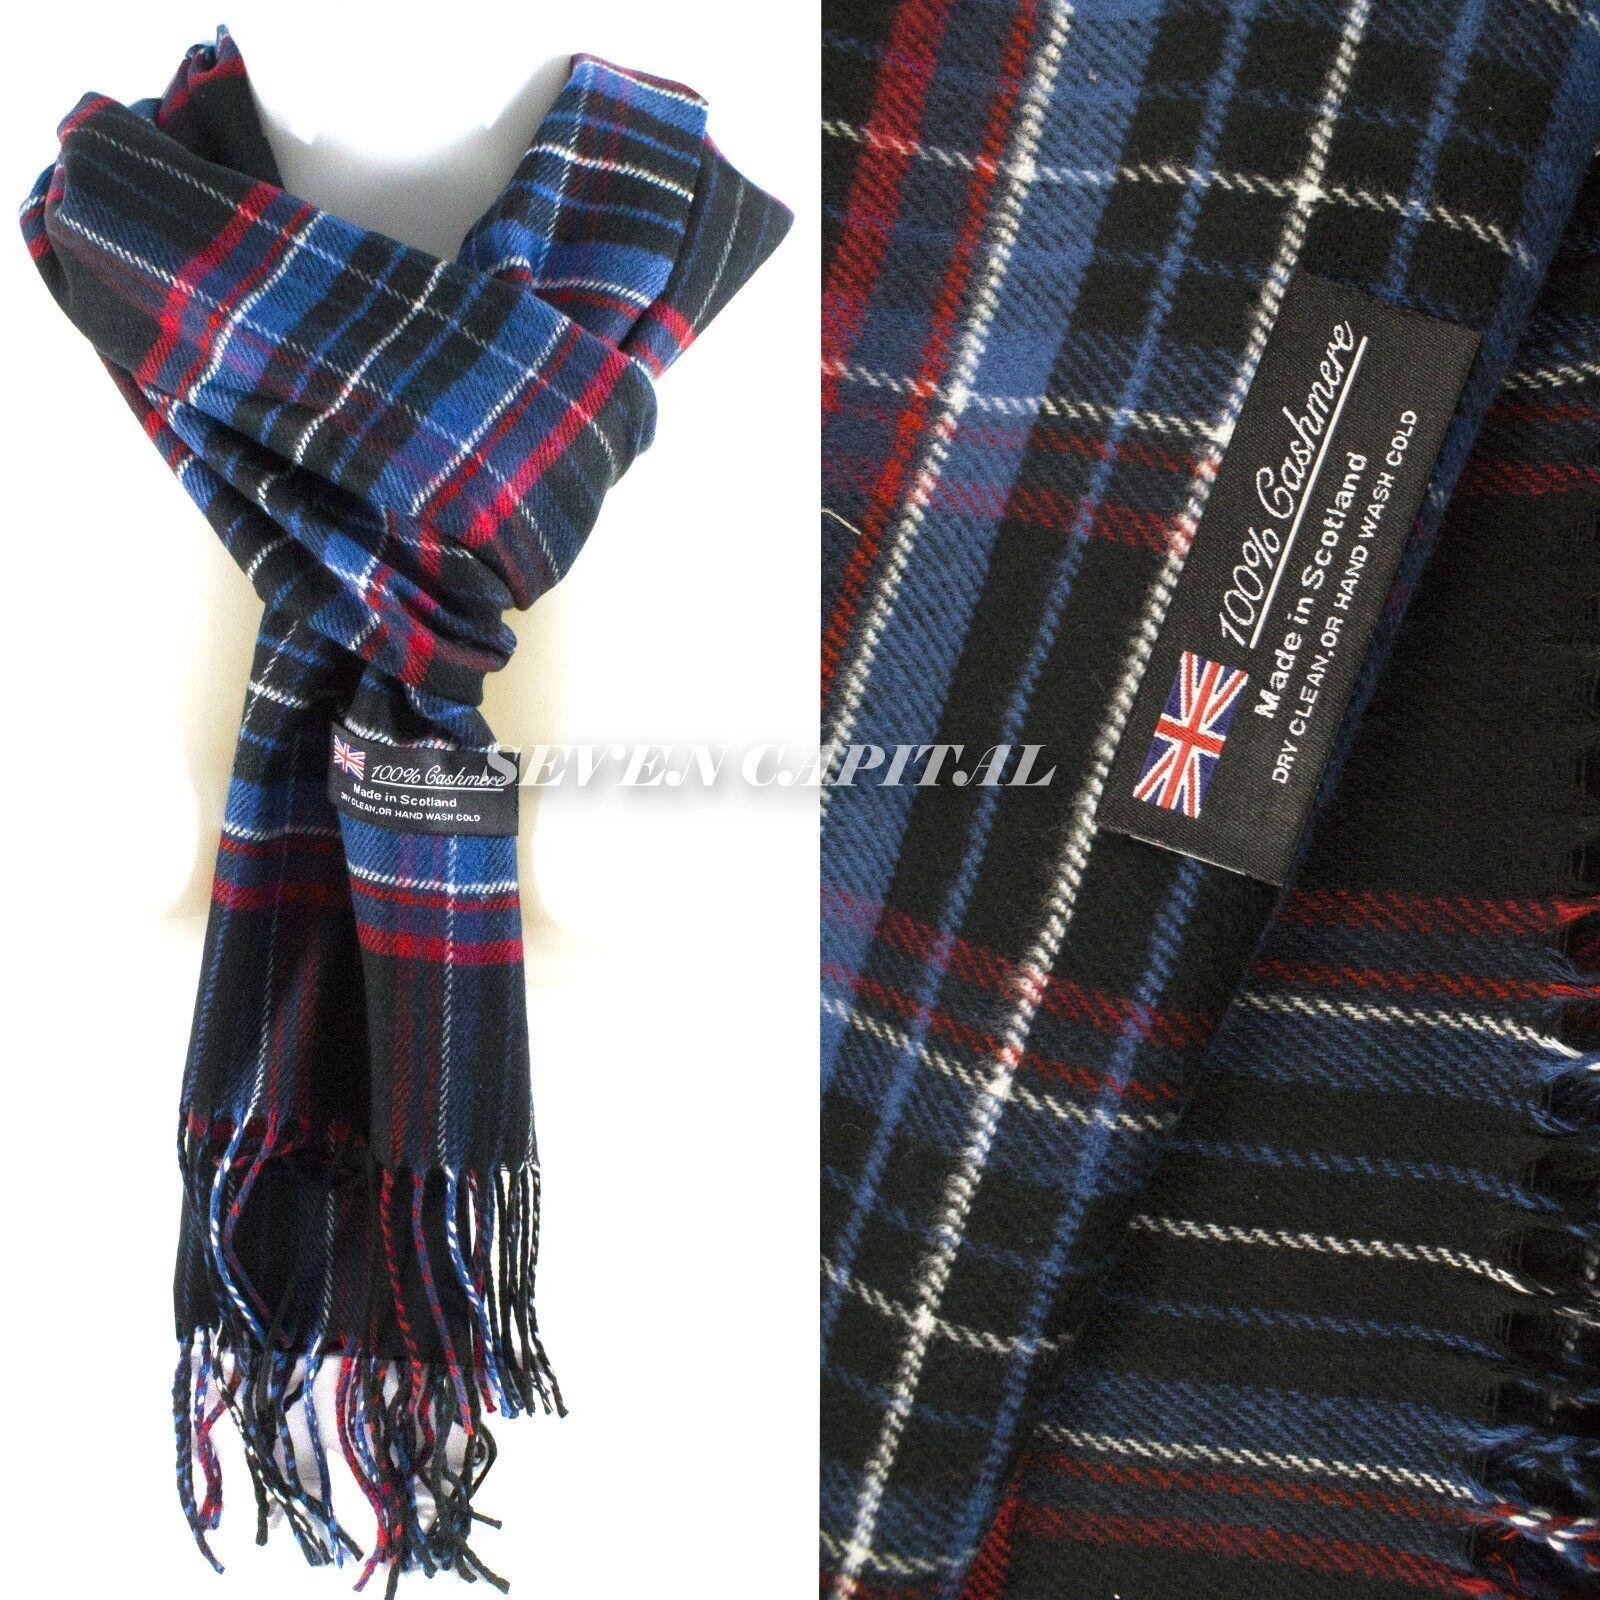 Mens Womens Winter Warm SCOTLAND Made 100% CASHMERE Scarf Scarves Plaid Wool 24. Plaid: Dark Navy